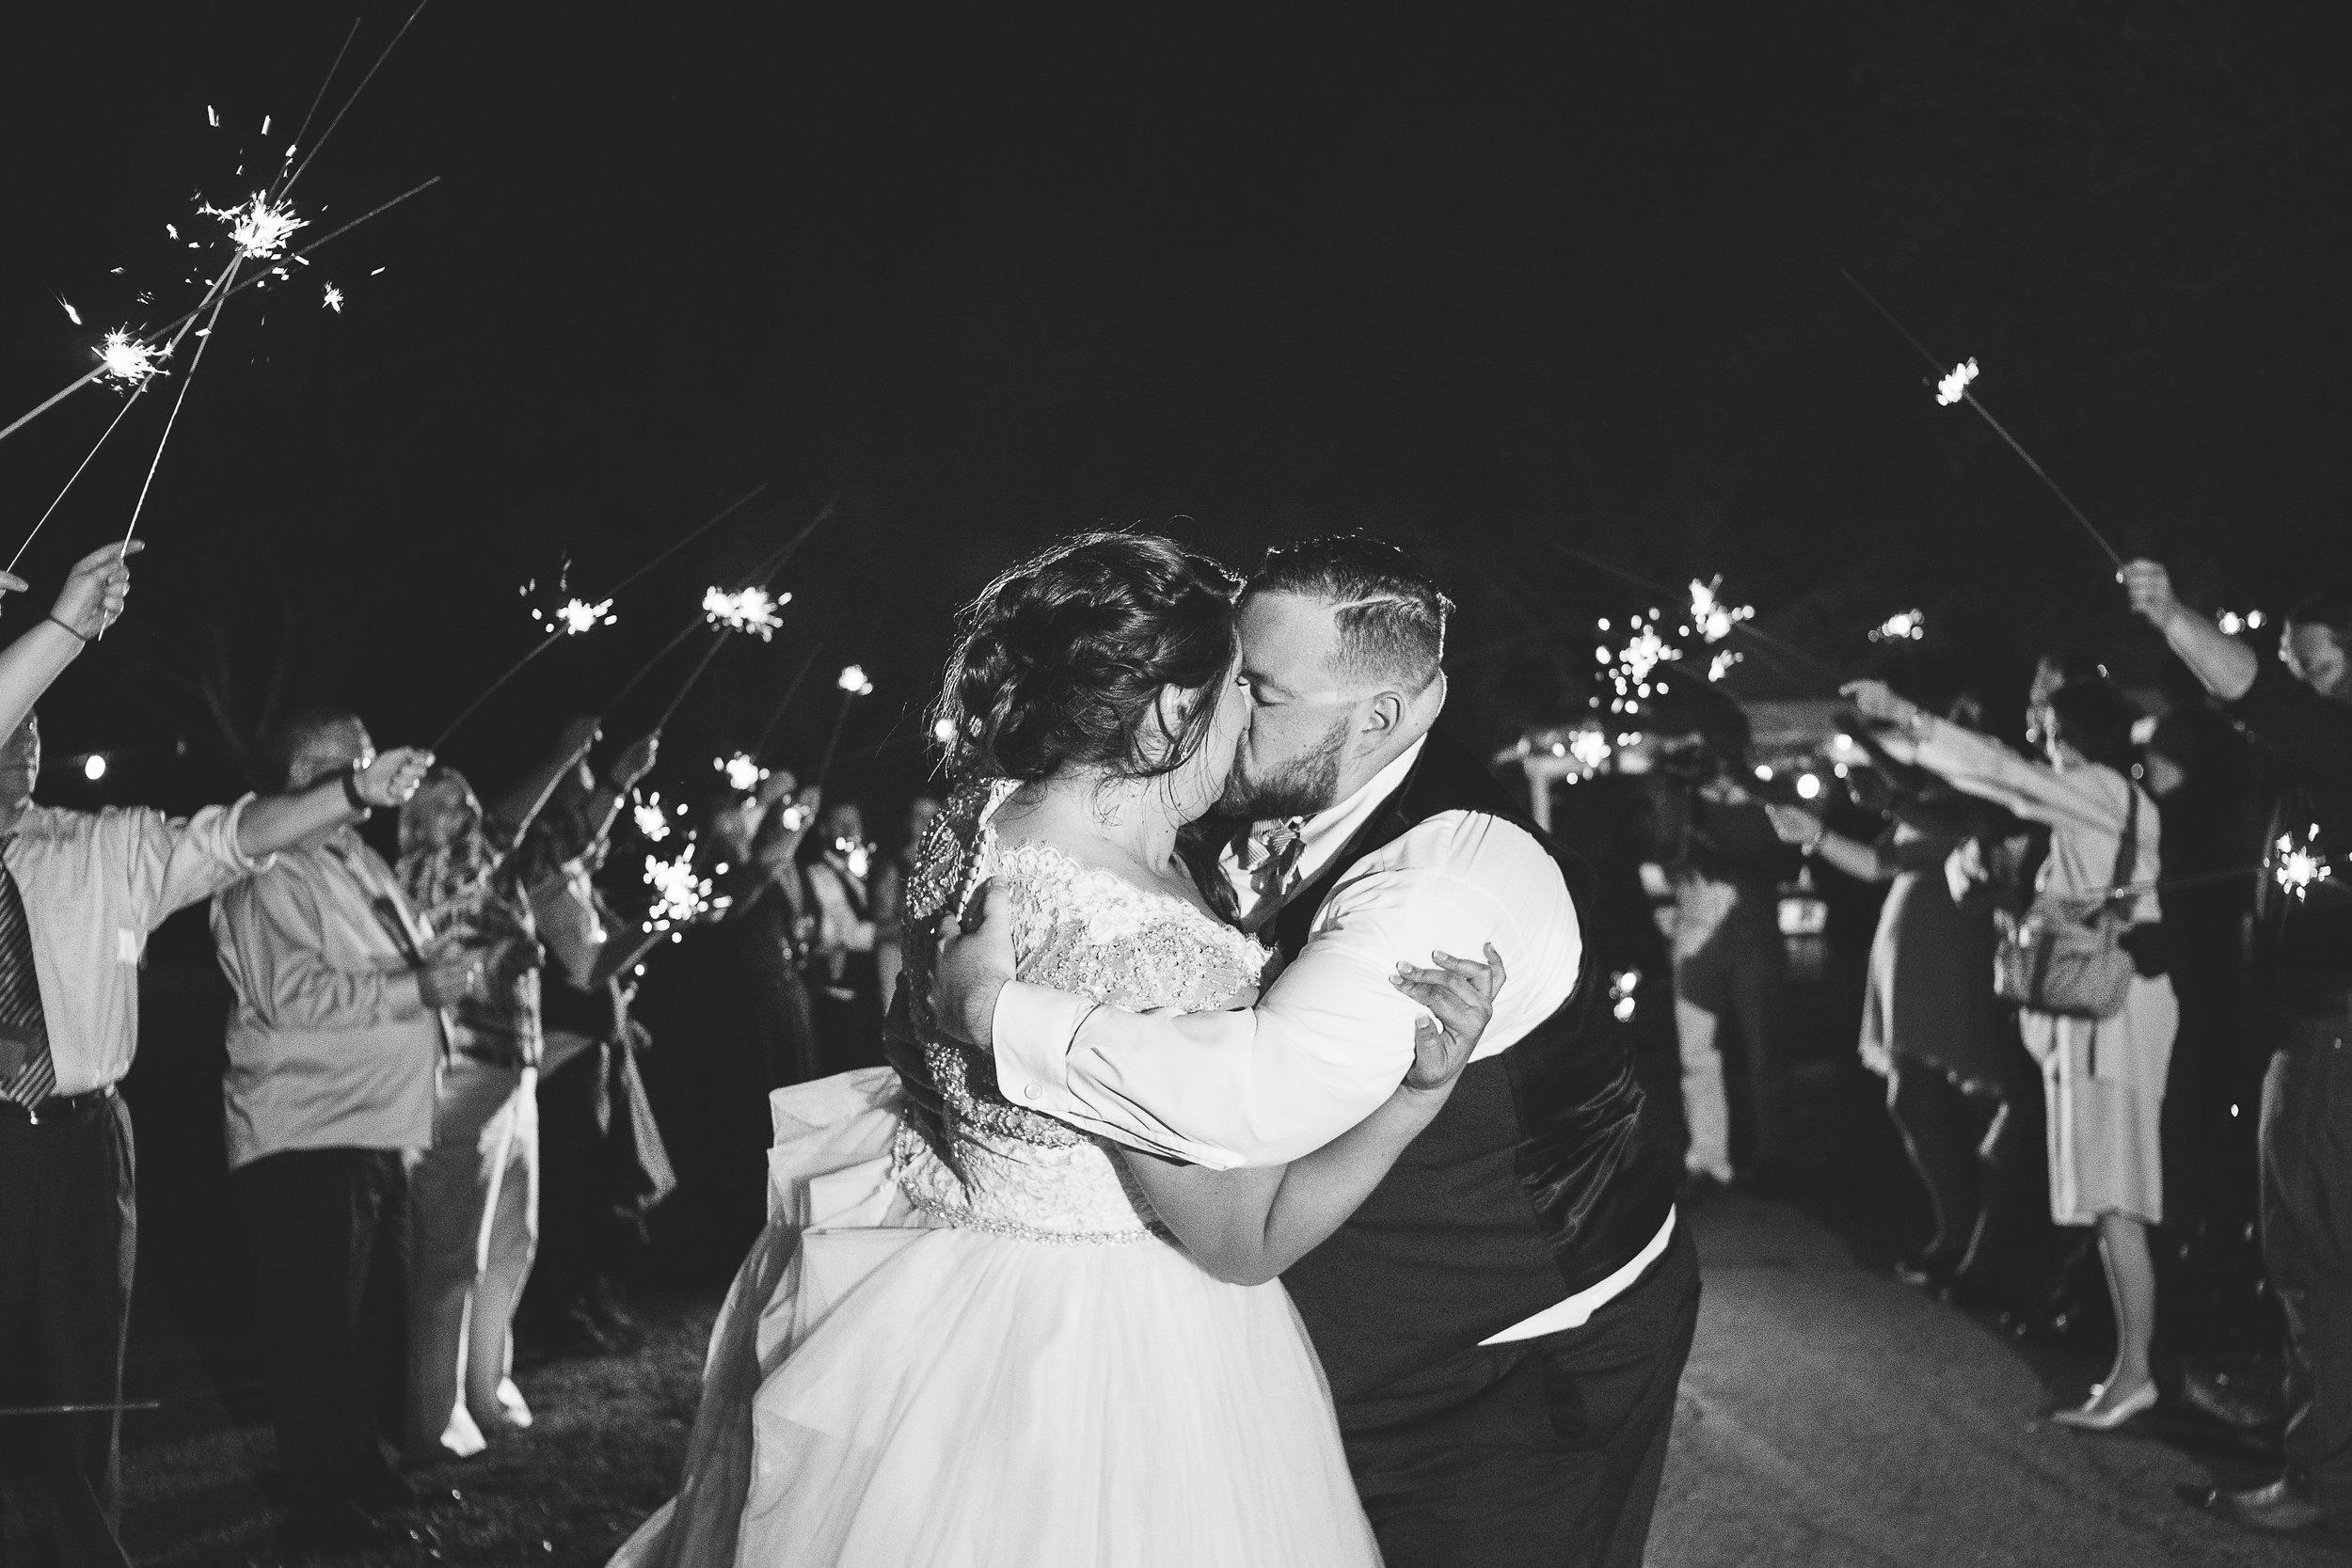 pittsburgh_wedding_photographer_liz_capuano-0210-2.jpg